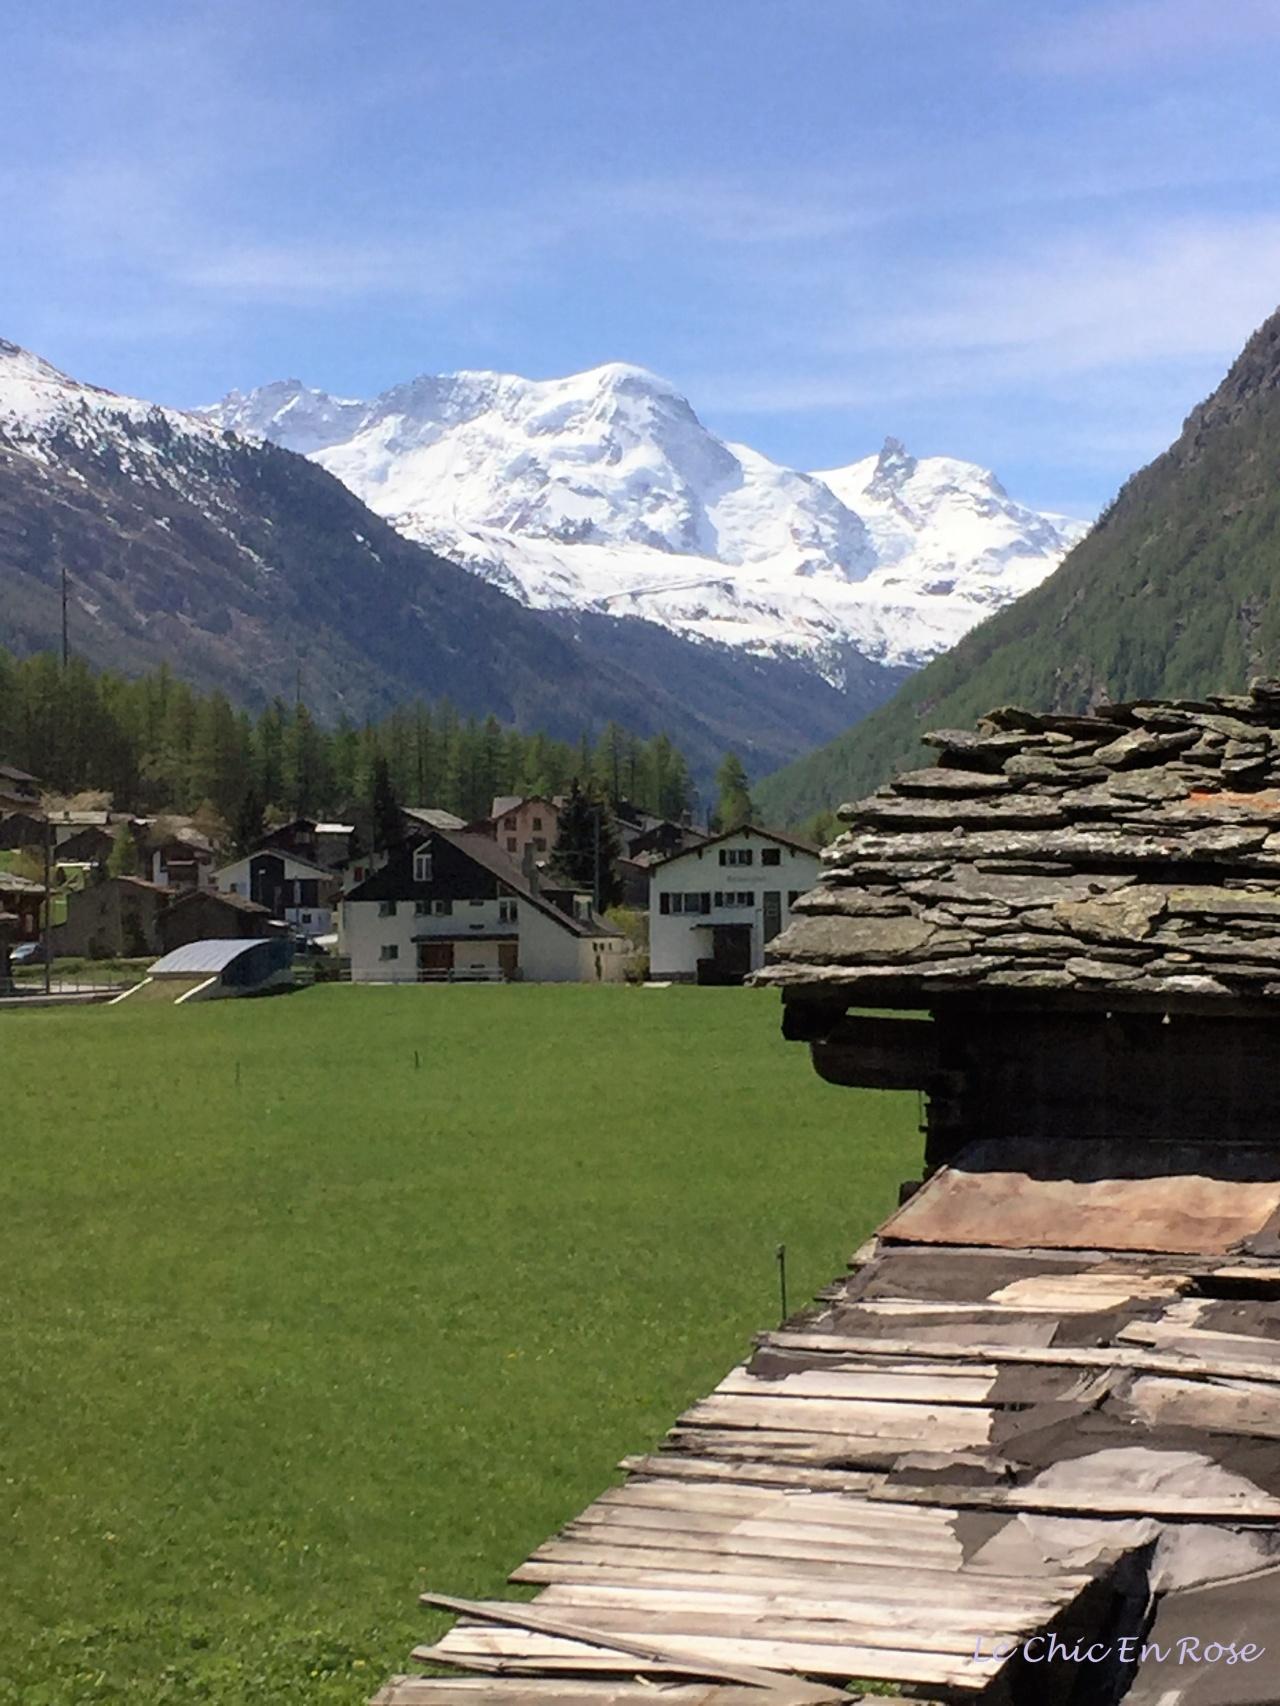 Alps near Zermatt - heading up the Matter Valley